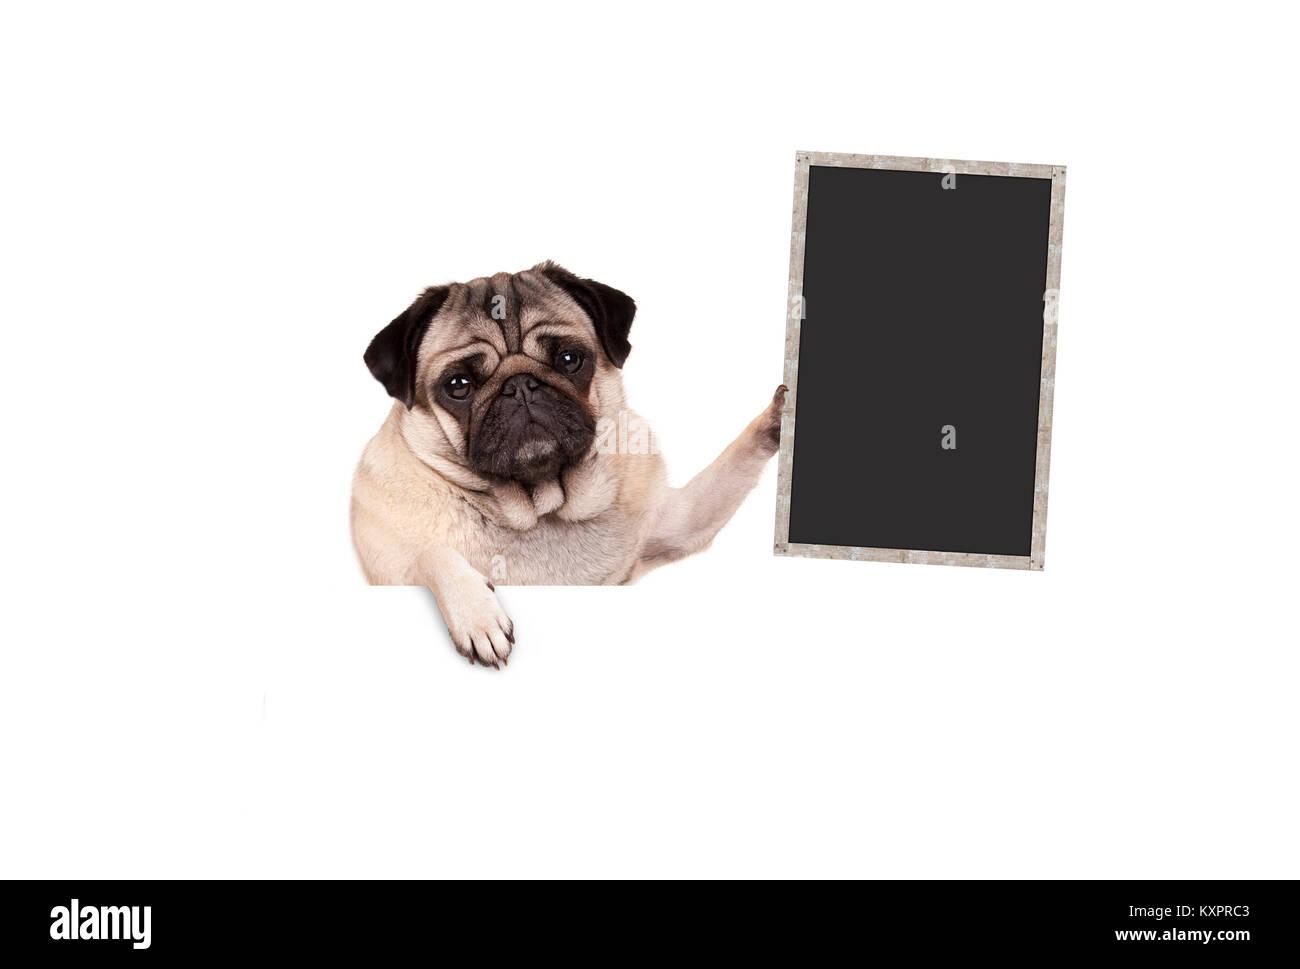 pug puppy dog holding up blank blackboard sign, hanging on white banner, isolated - Stock Image